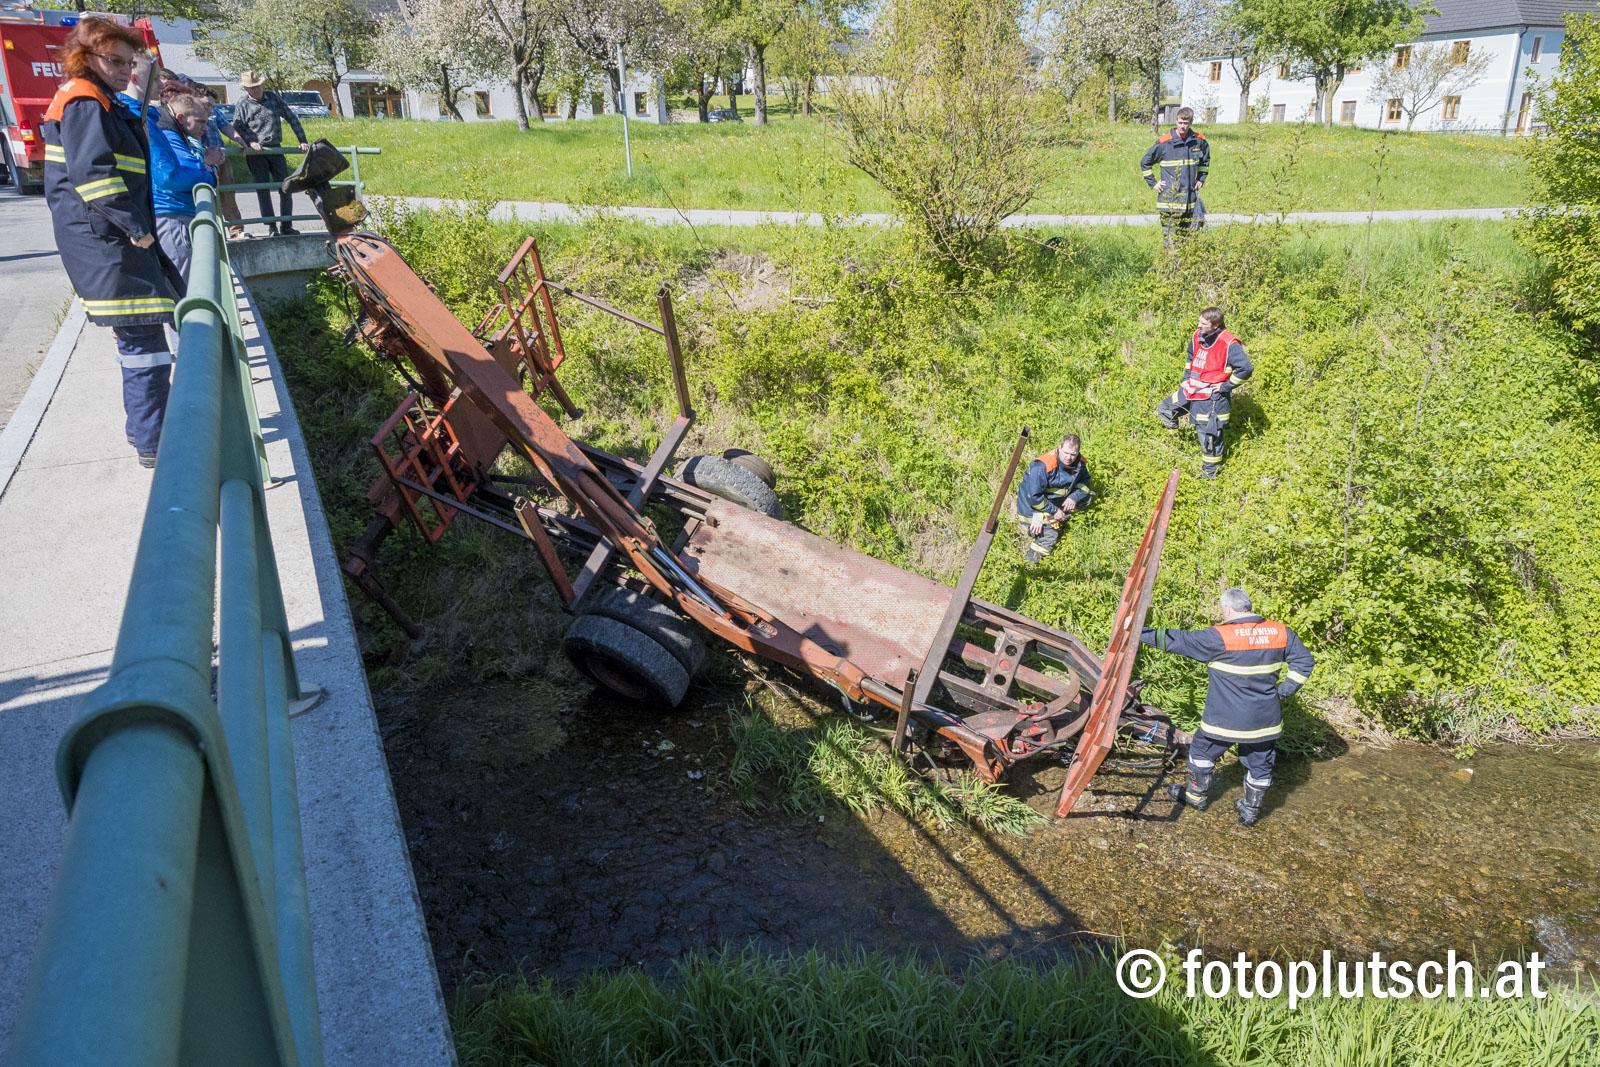 Unfall_mit_Traktor _in_großeigen_Mank_30042016_fotoplutsch 3_